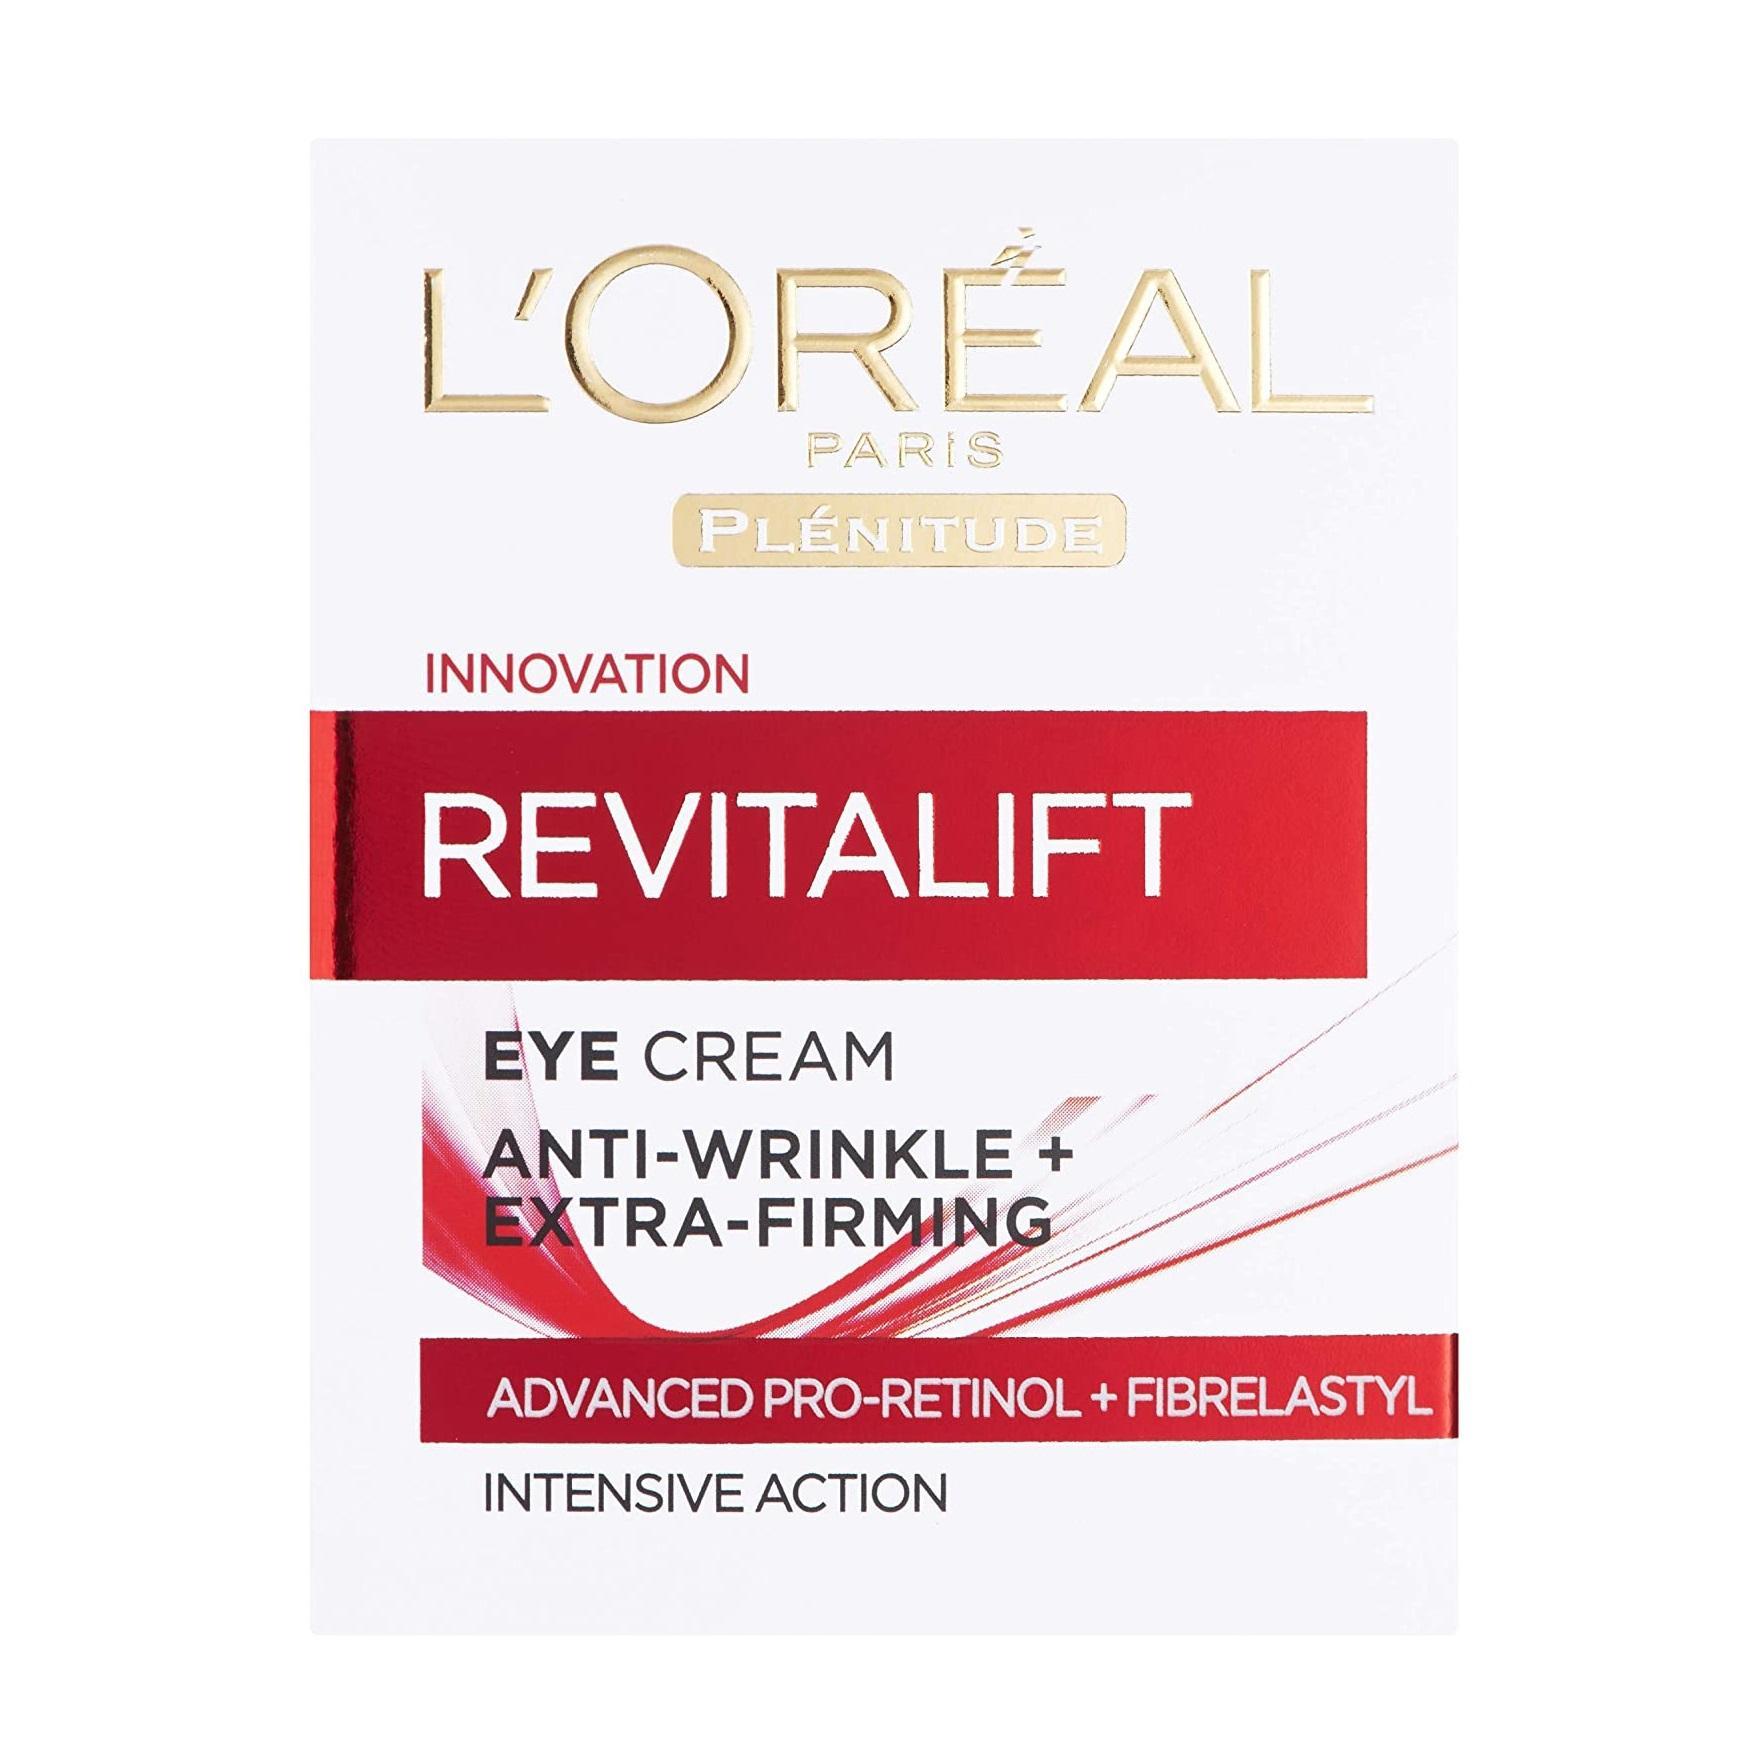 L'Oréal 欧莱雅 Revitalift 复颜抗皱紧致滋润眼霜 15ml